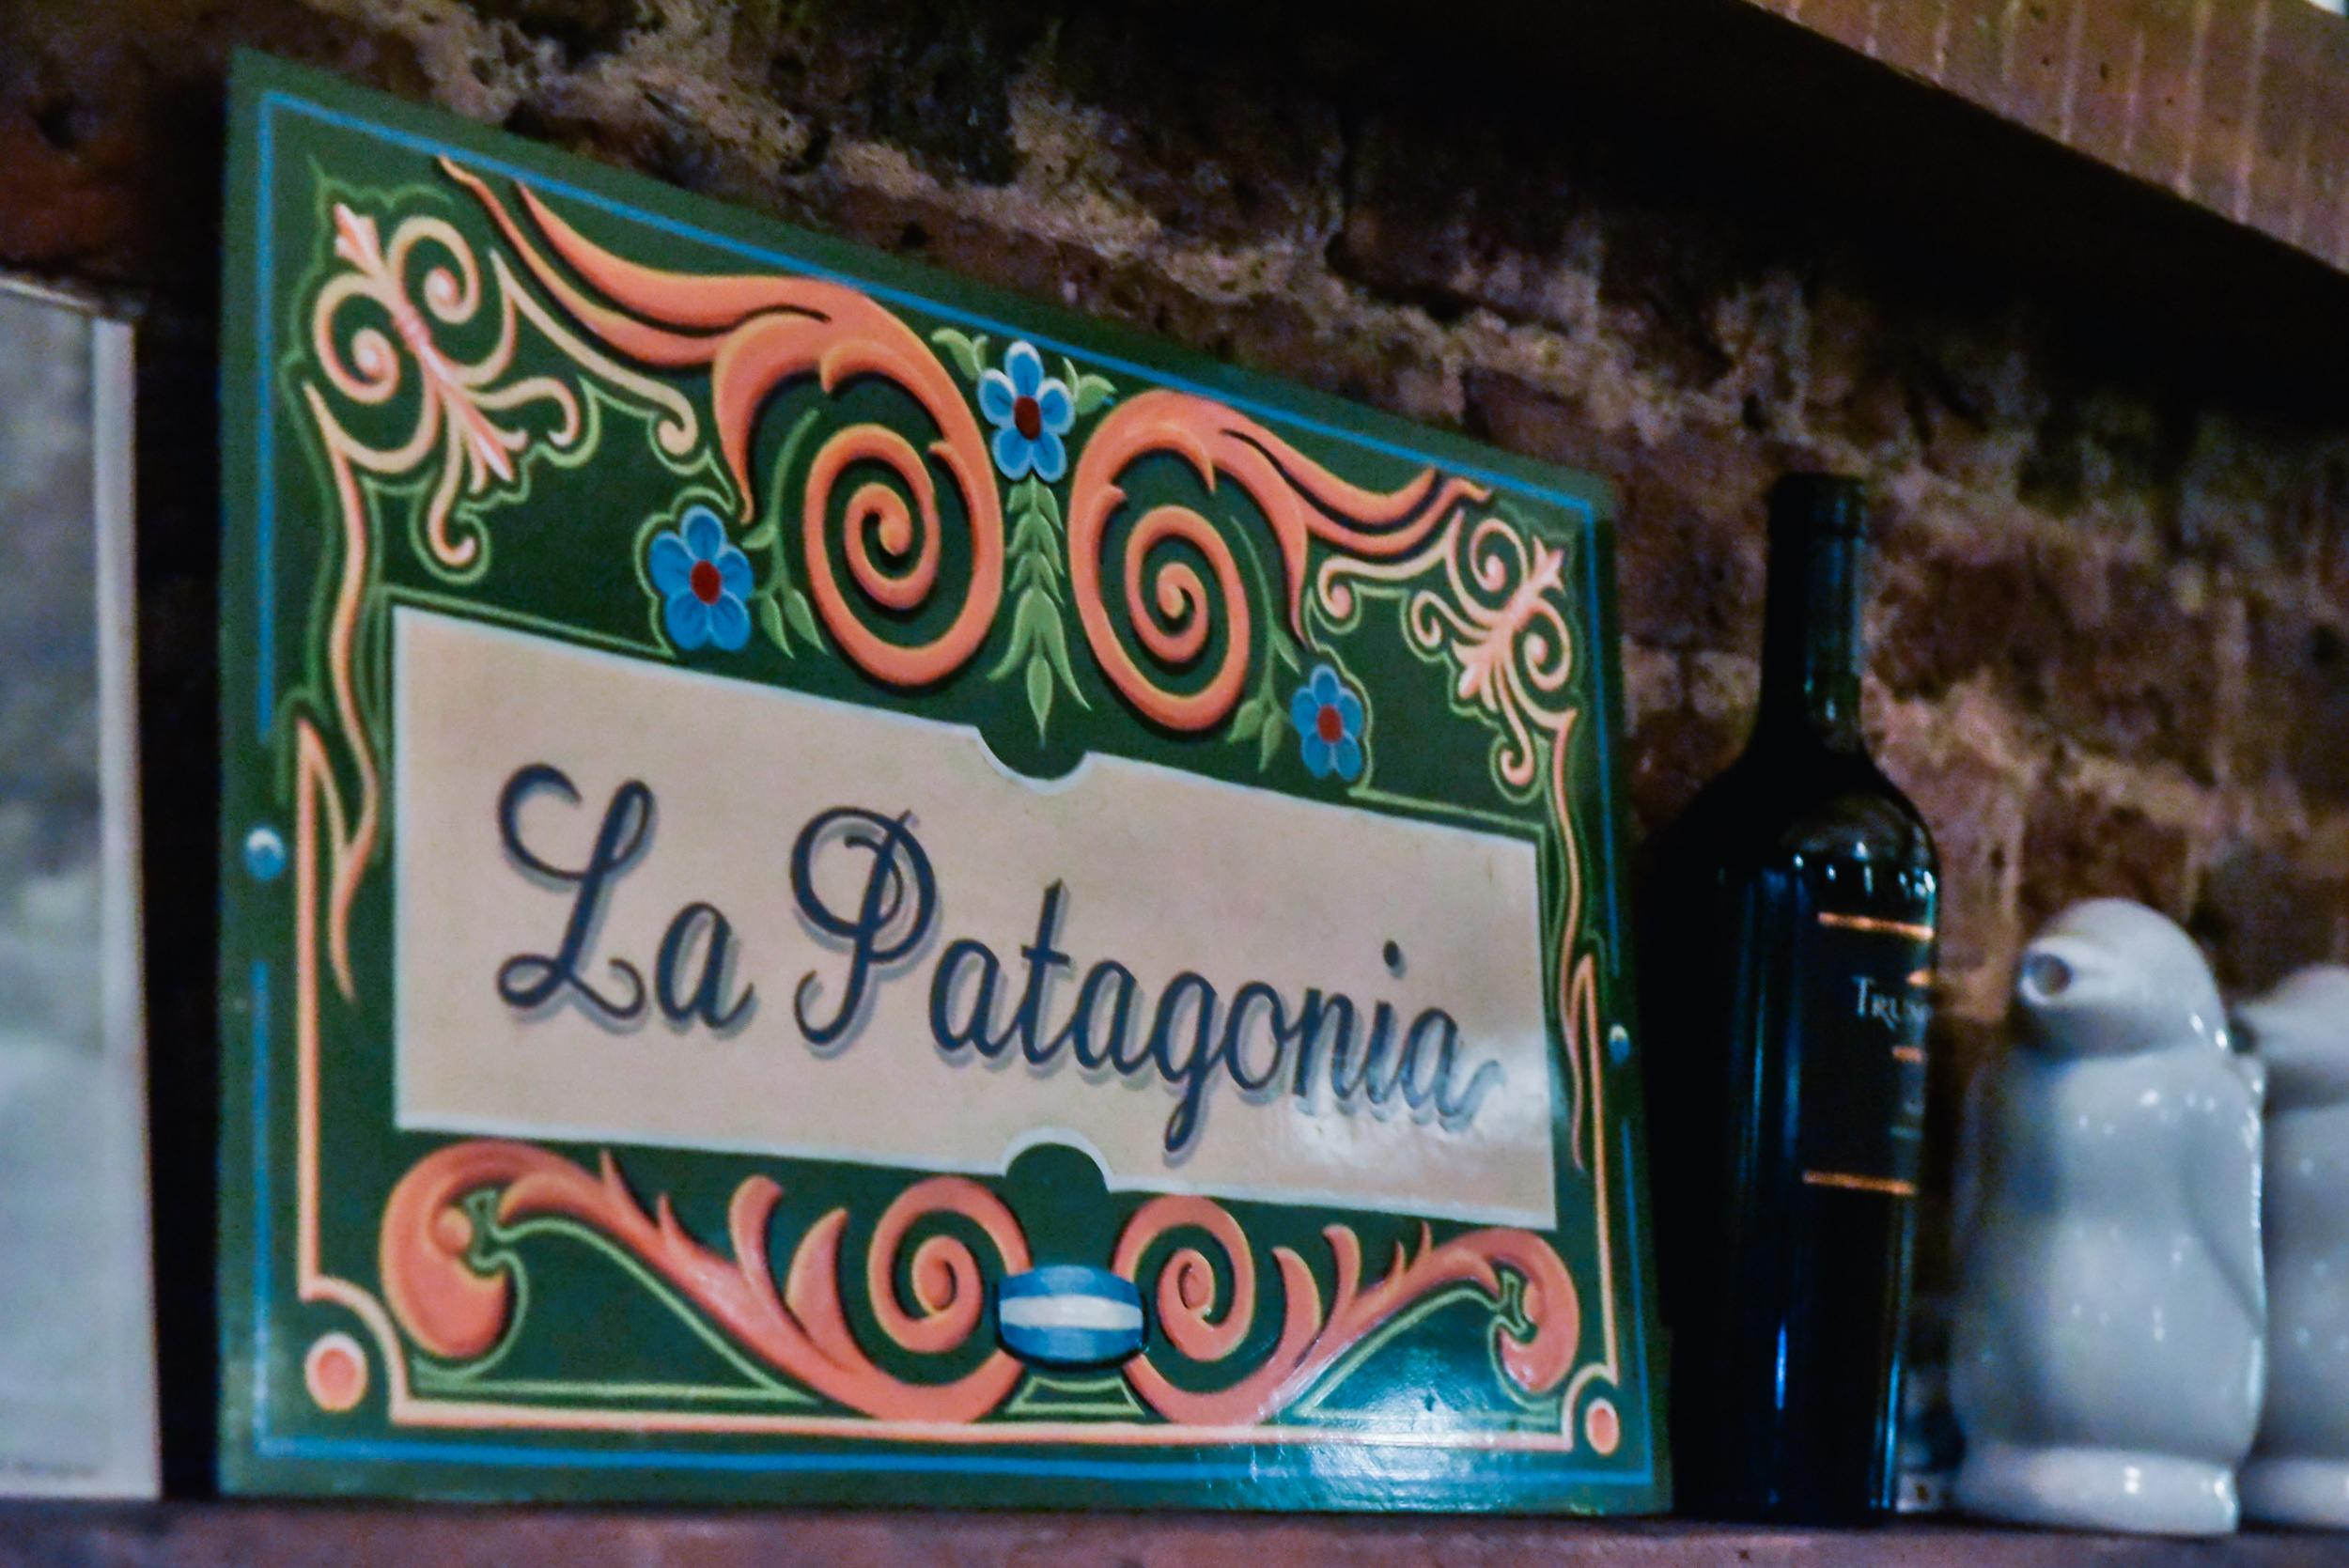 la-patagonia-november-25-2015-15-zf-3402-60545-1-001-007